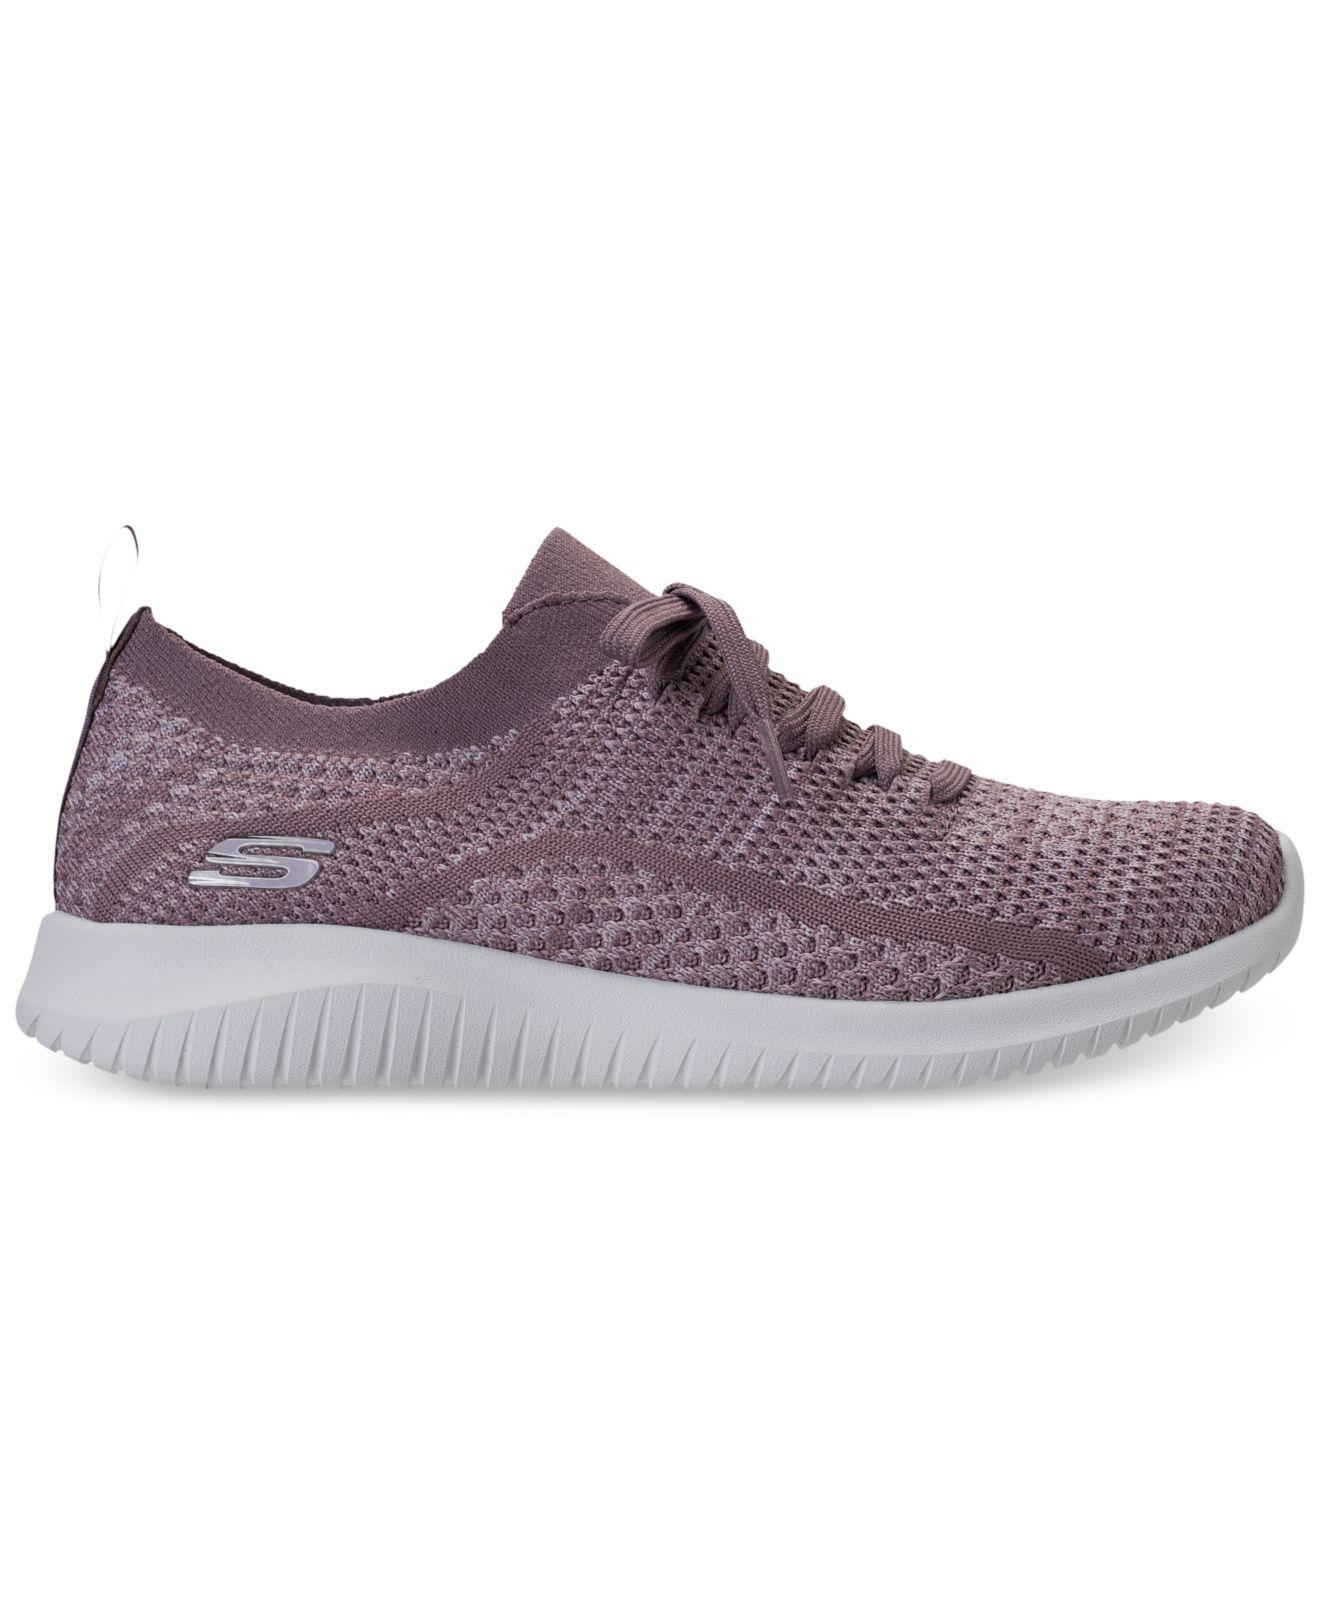 c166ac6974a Lyst - Skechers Wo Trainers Beige in Purple - Save 15%